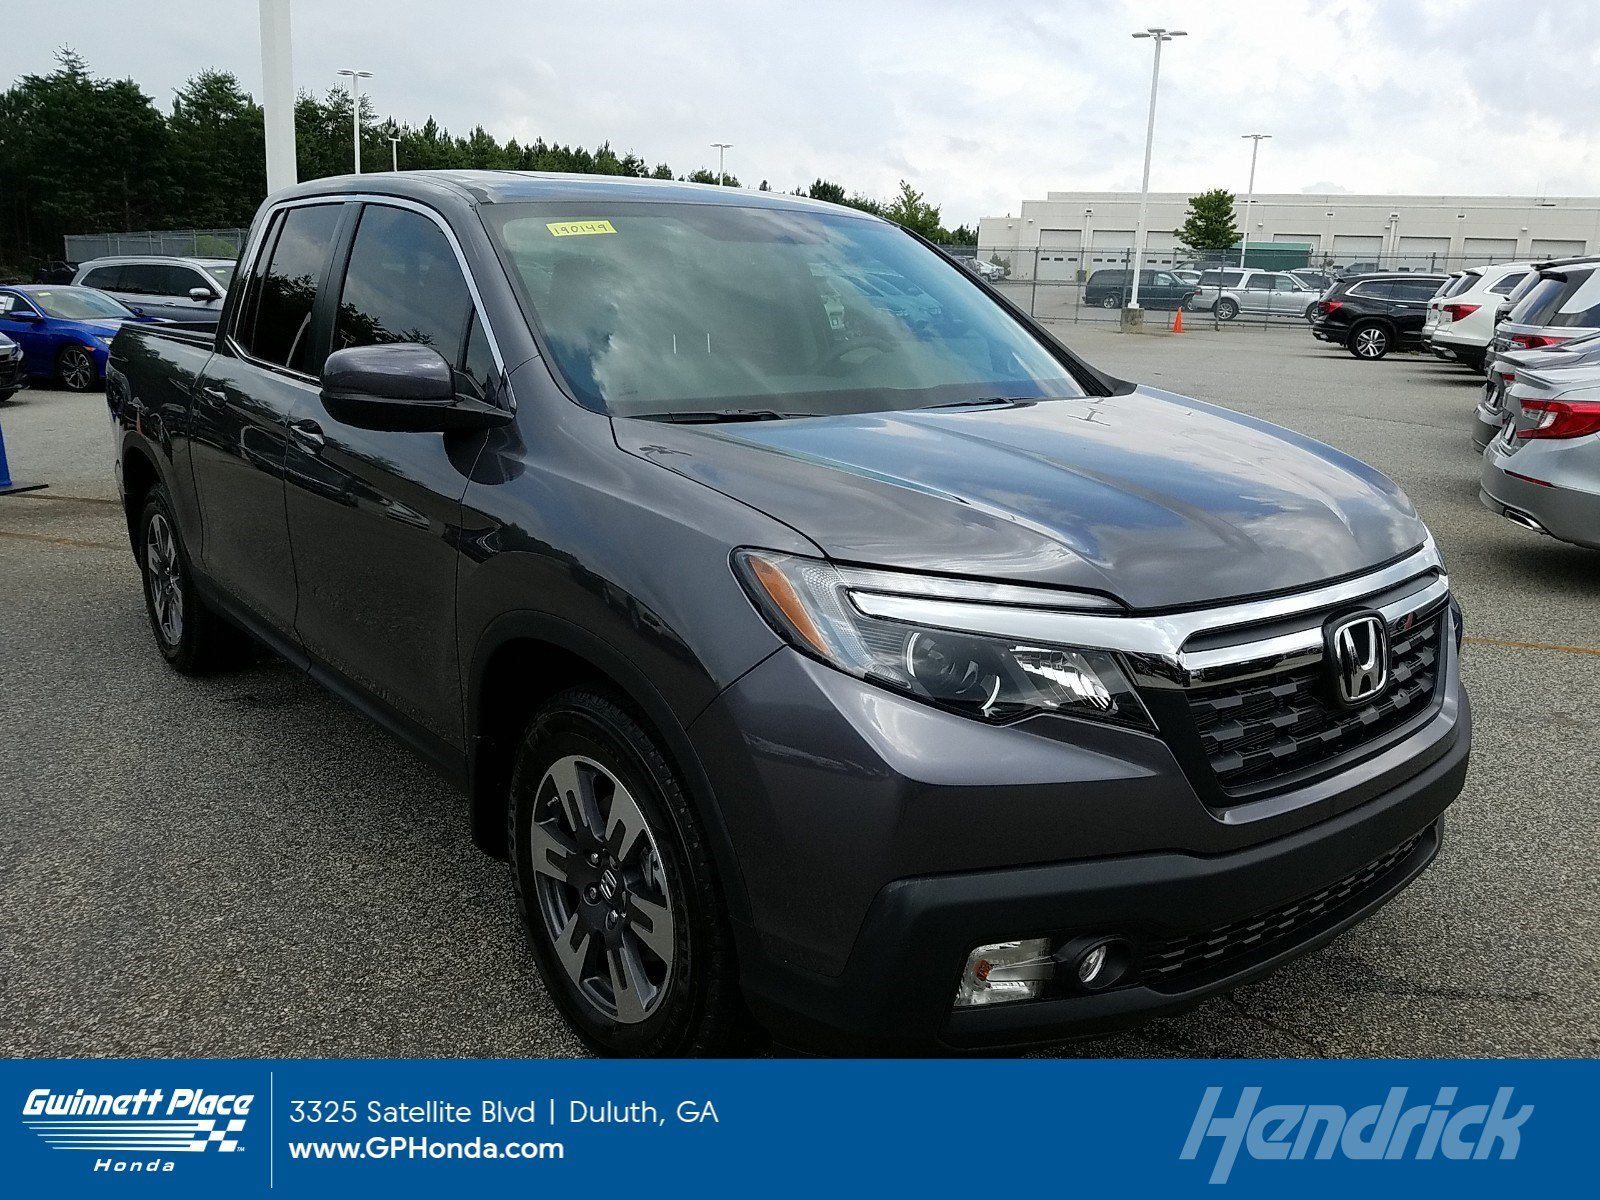 New 2019 Honda Ridgeline RTL 2WD Pickup for sale in Duluth, GA